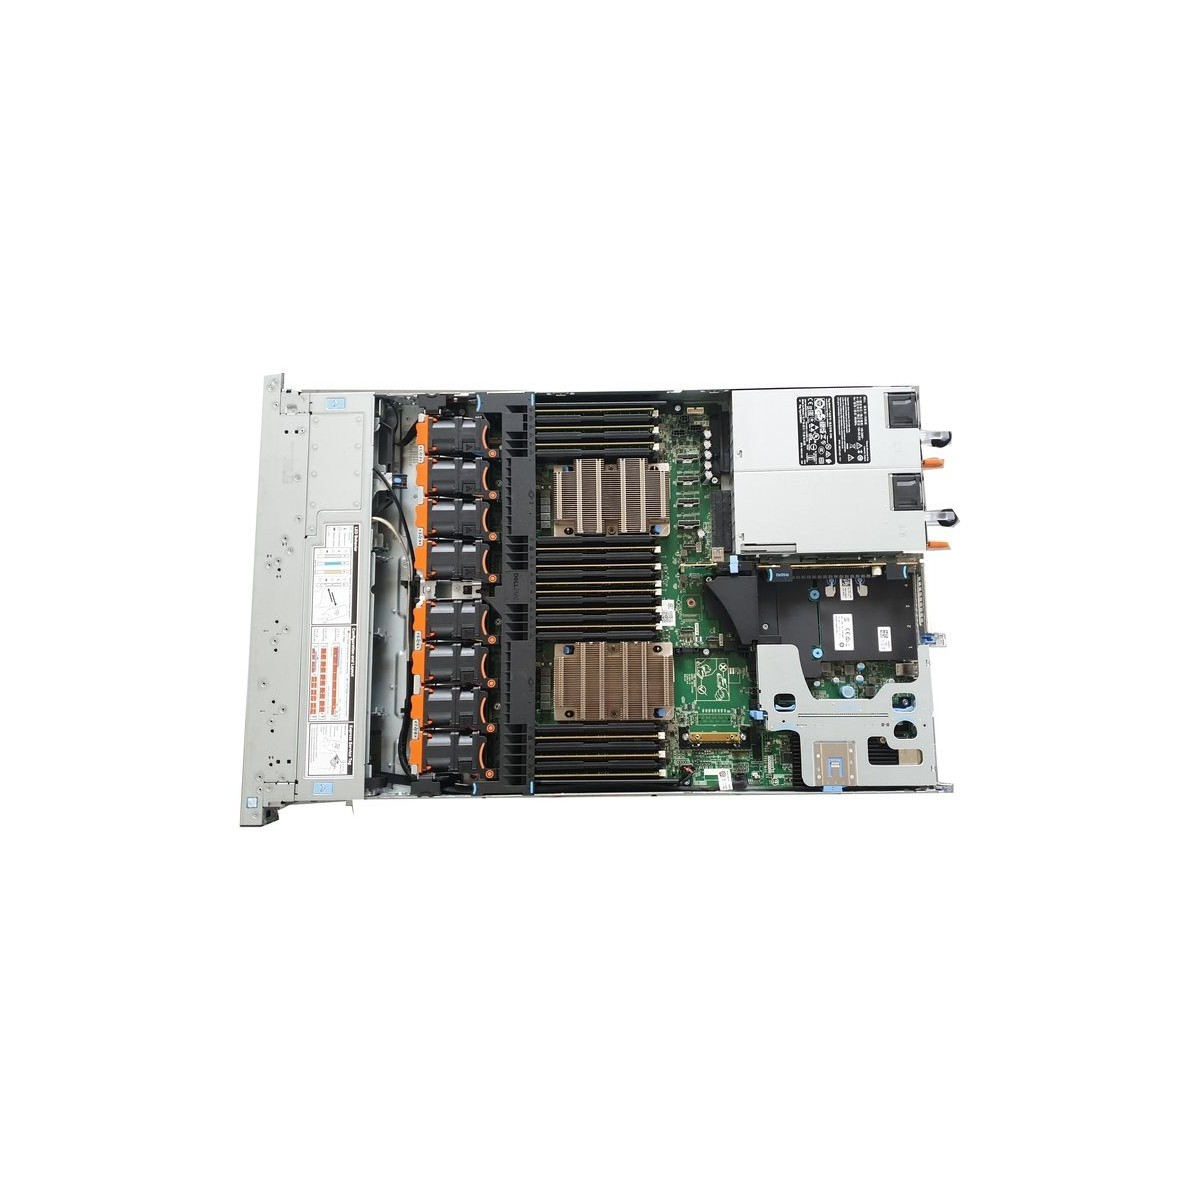 DELL POWERCONNECT 6248 48x1GBit 4xSFP RACK GW FV